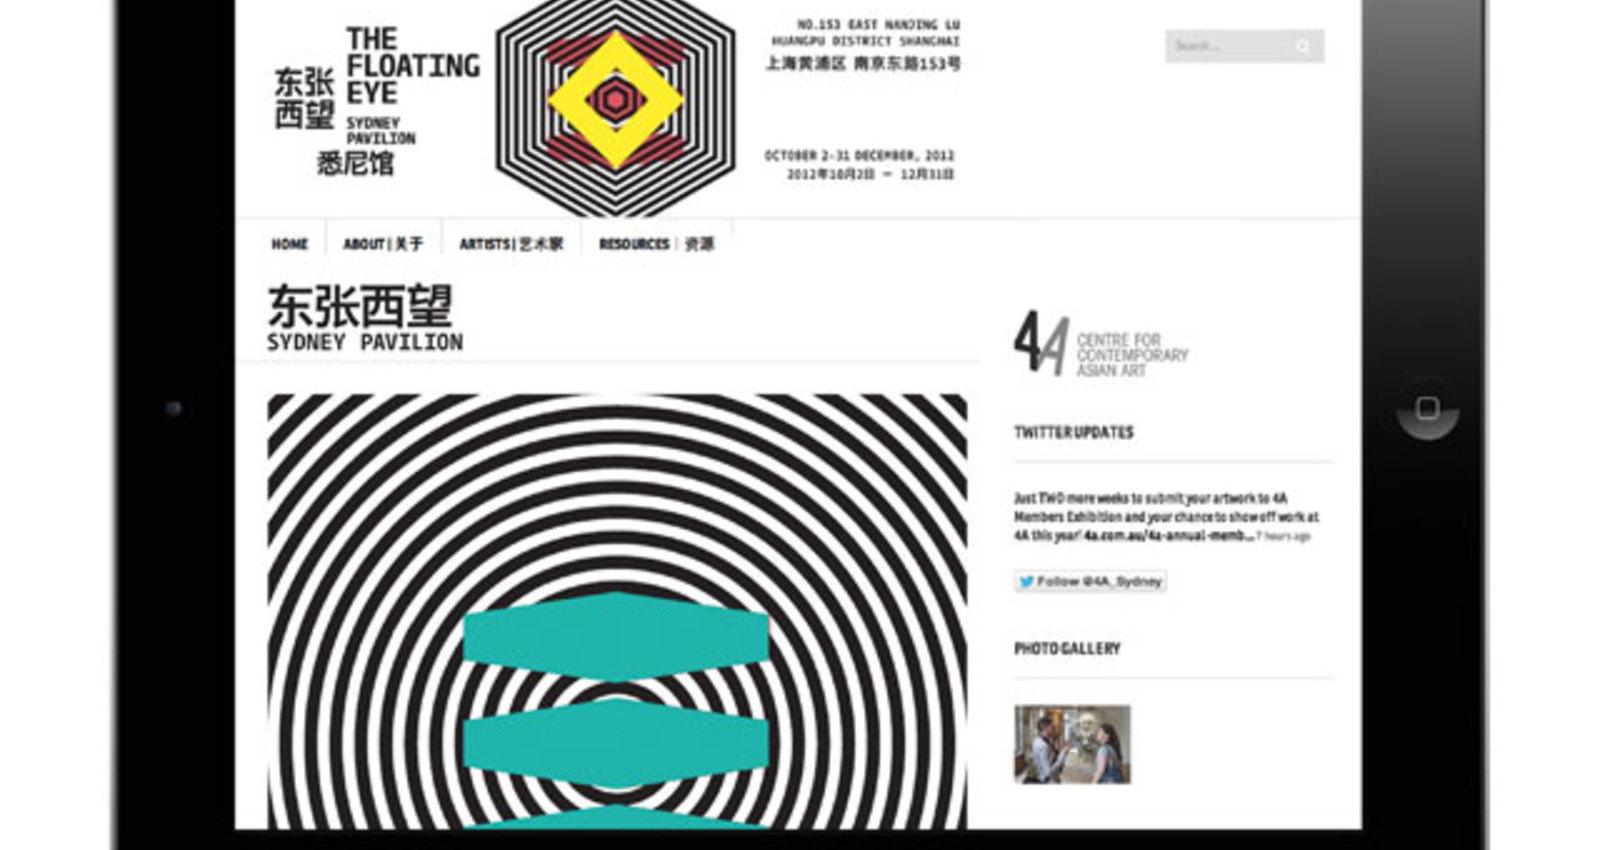 Sydney Pavilion / Shanghai Biennale